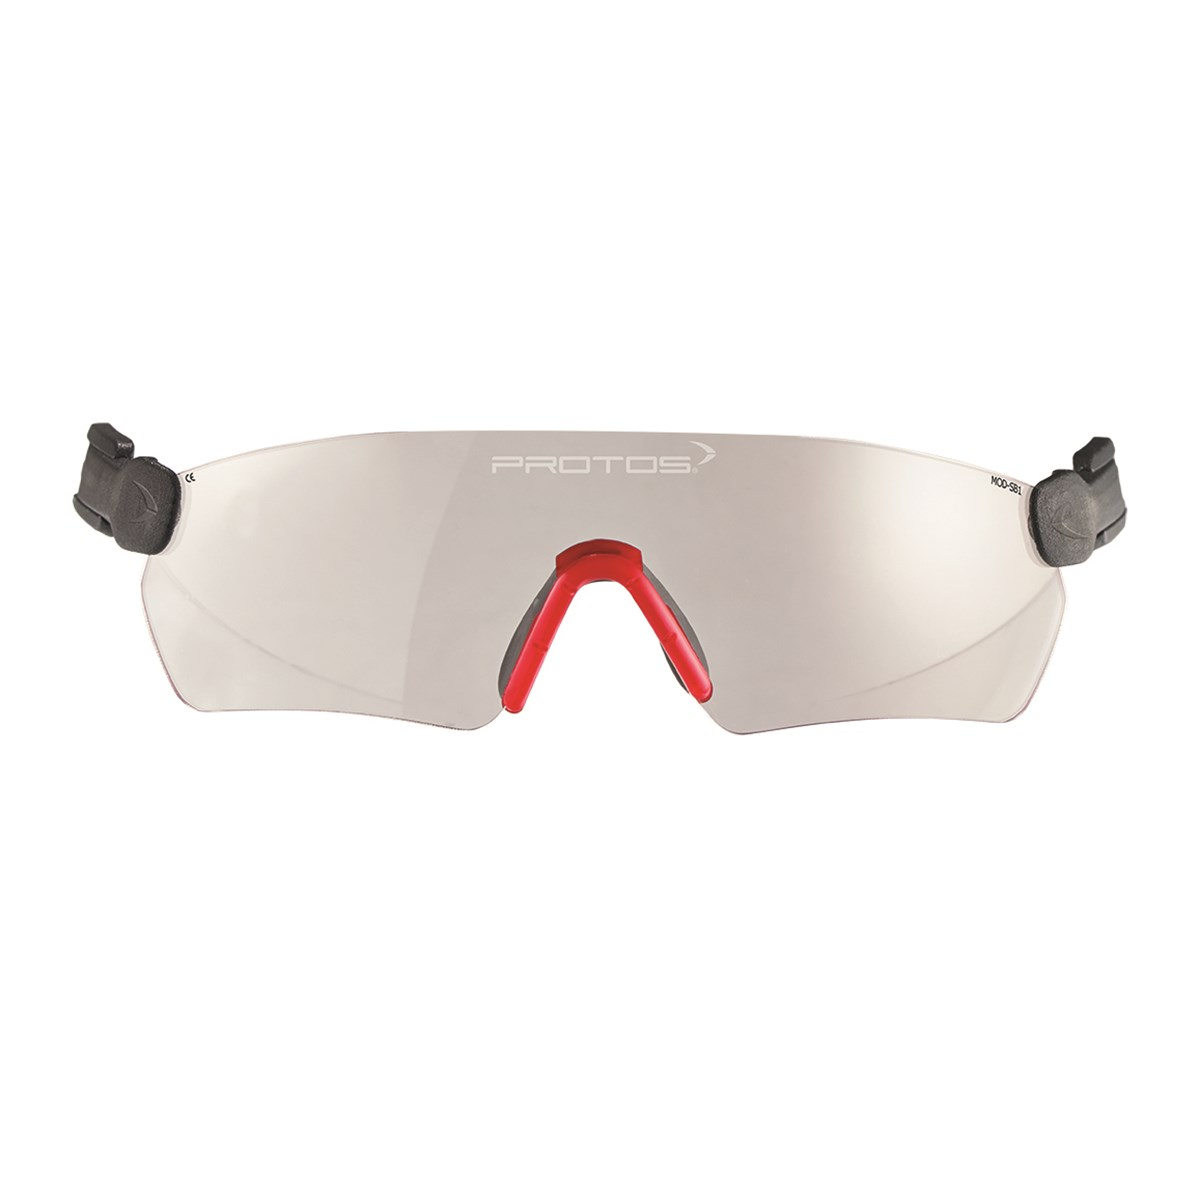 Protos inzet veiligheidsbril transparant